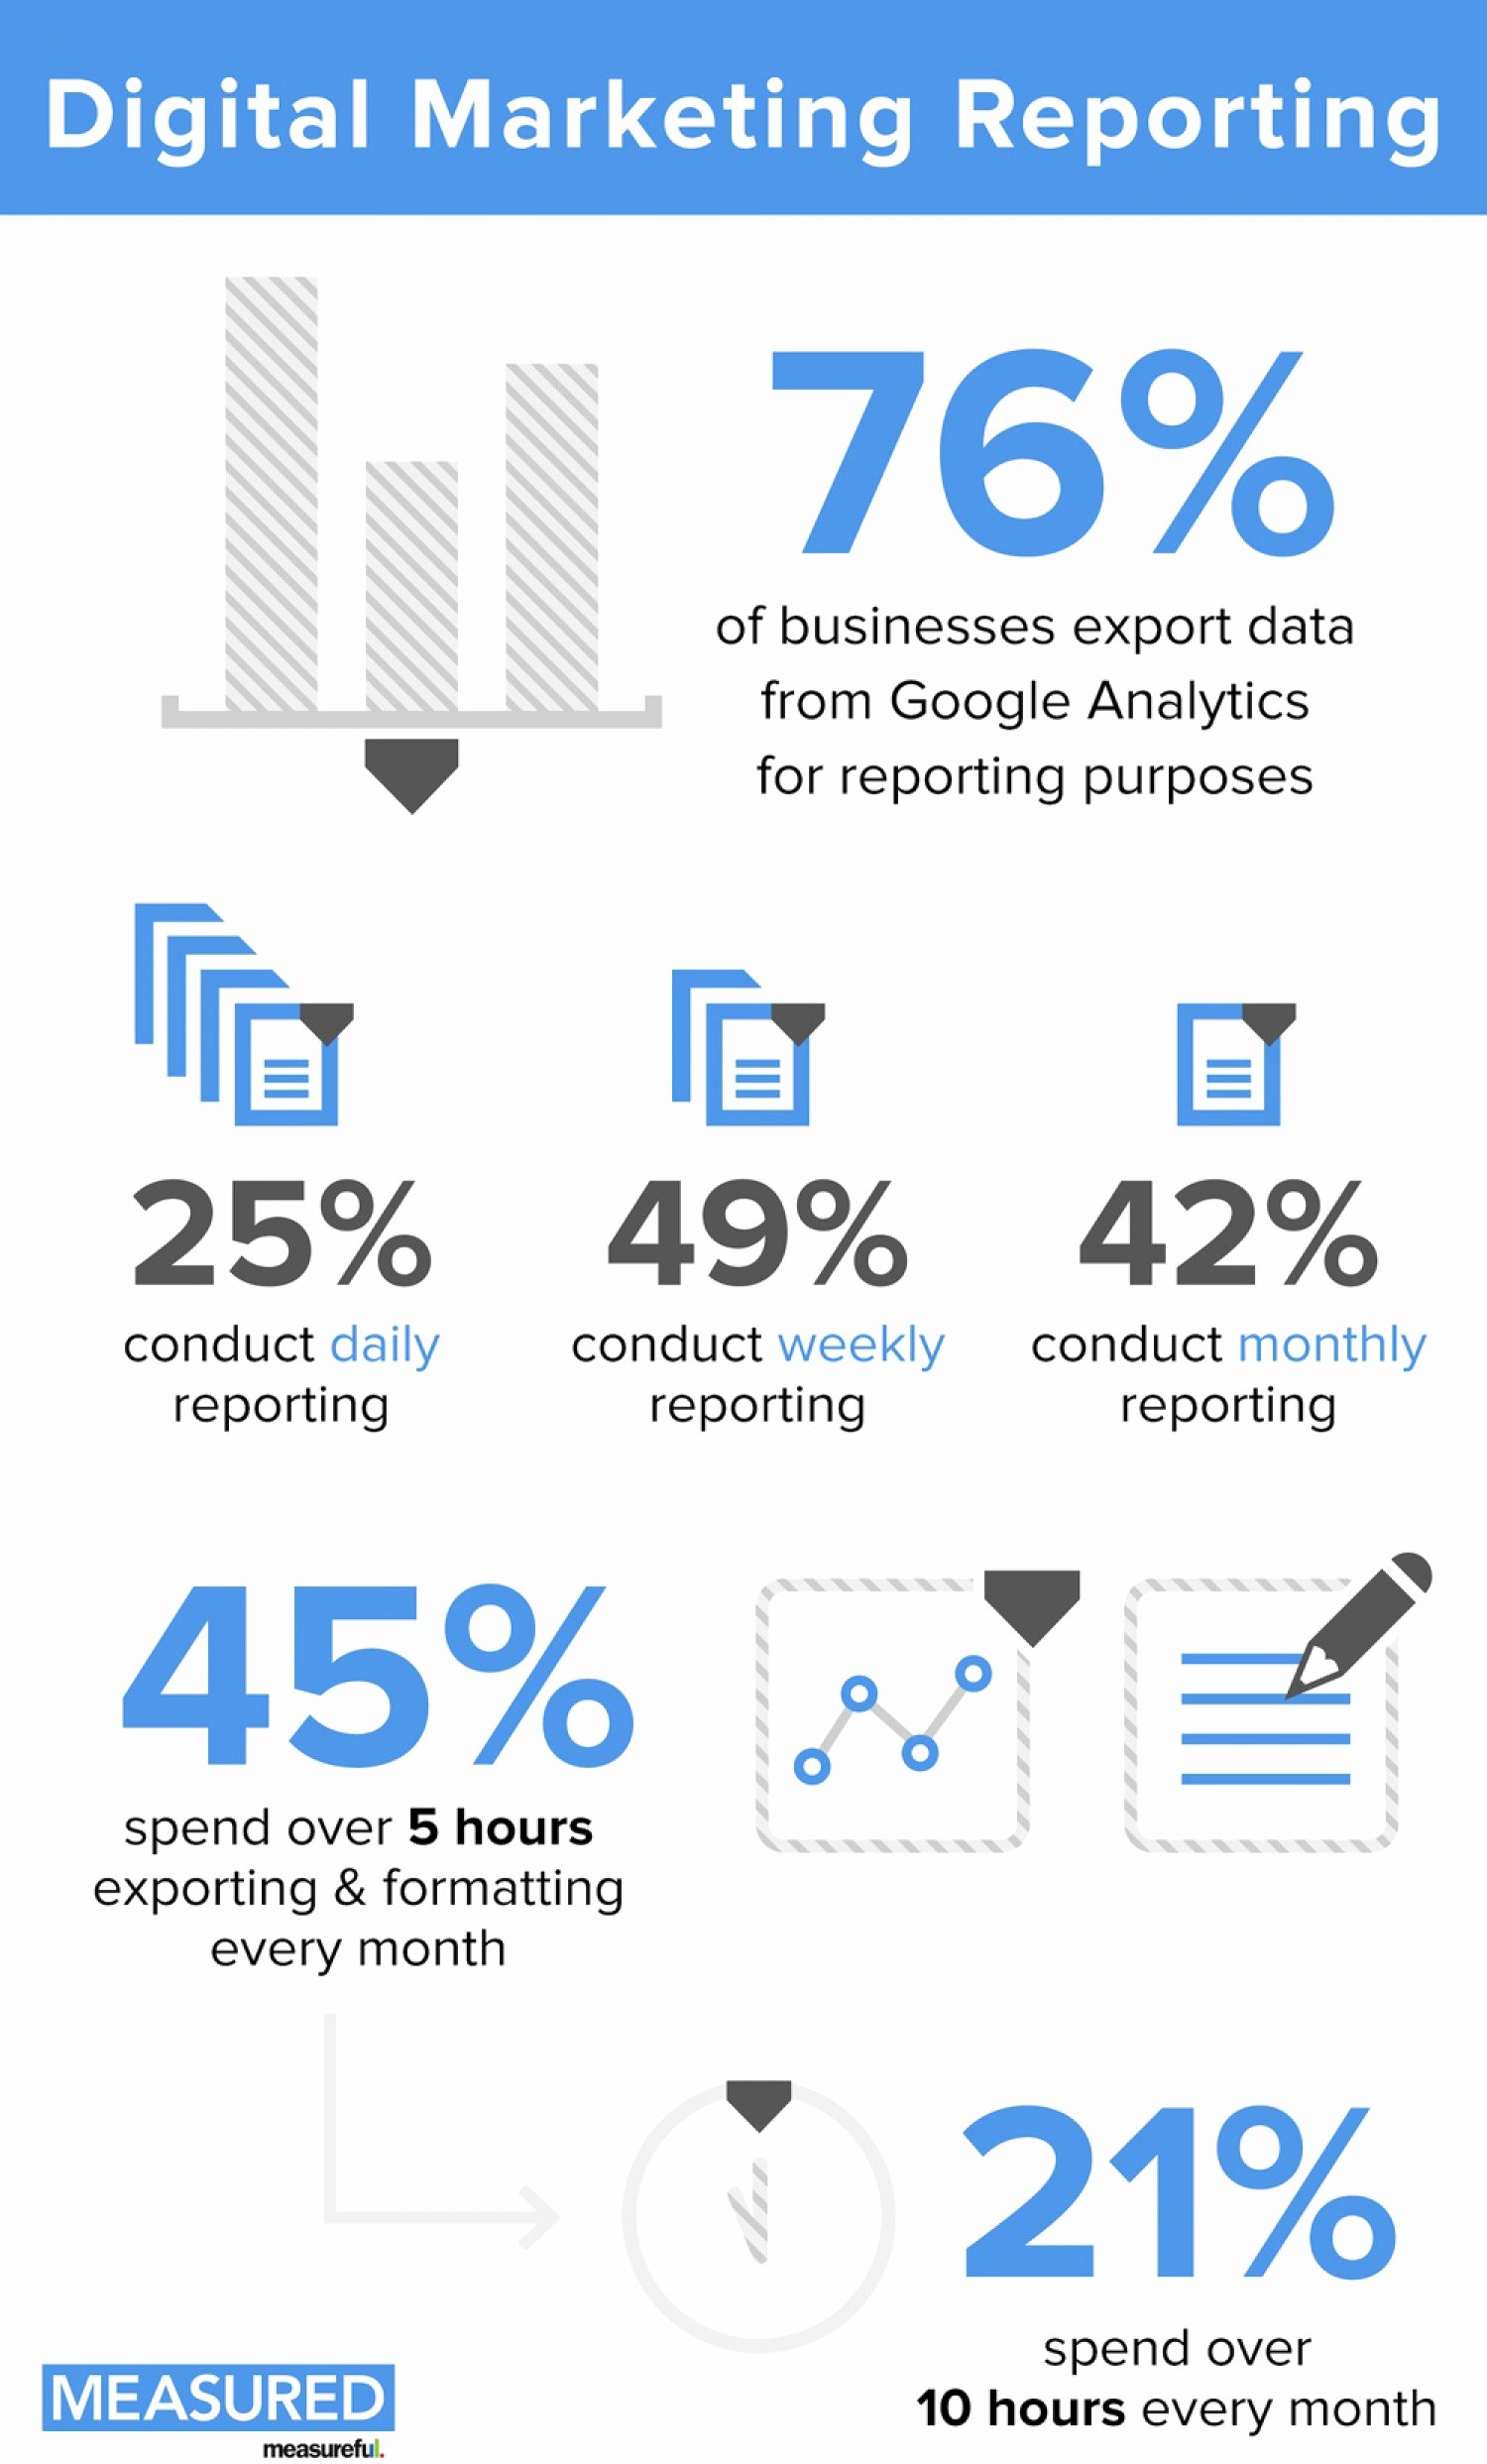 Digital Marketing Report Template Inspirational Digital Marketing Reporting